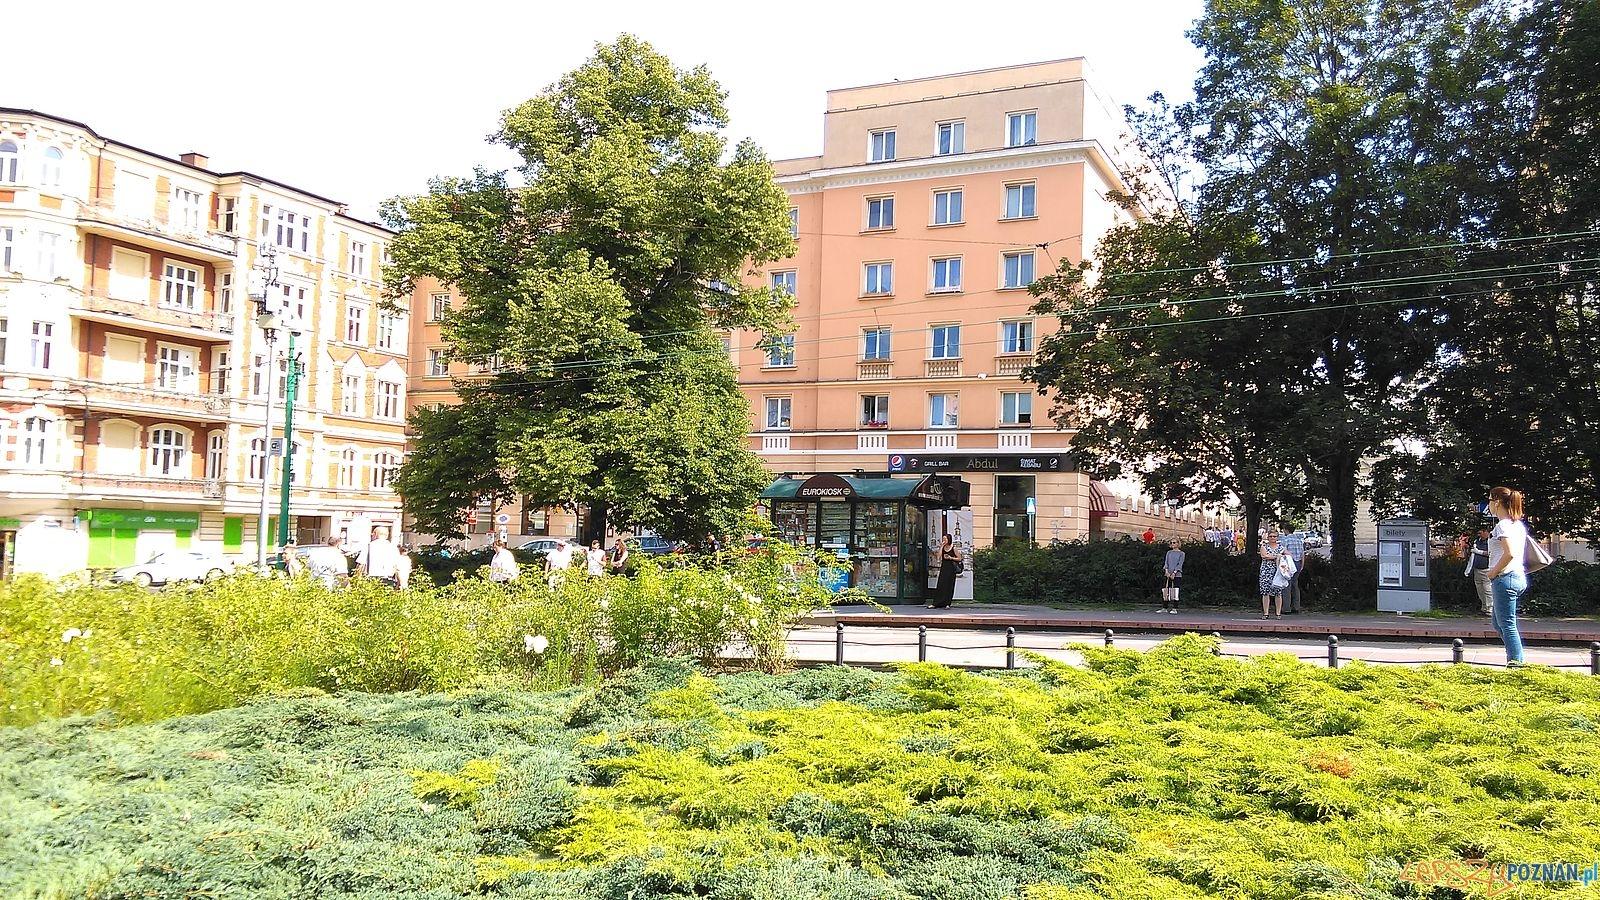 Plac Ratajskiego (5)  Foto: T. Dworek / ROSM